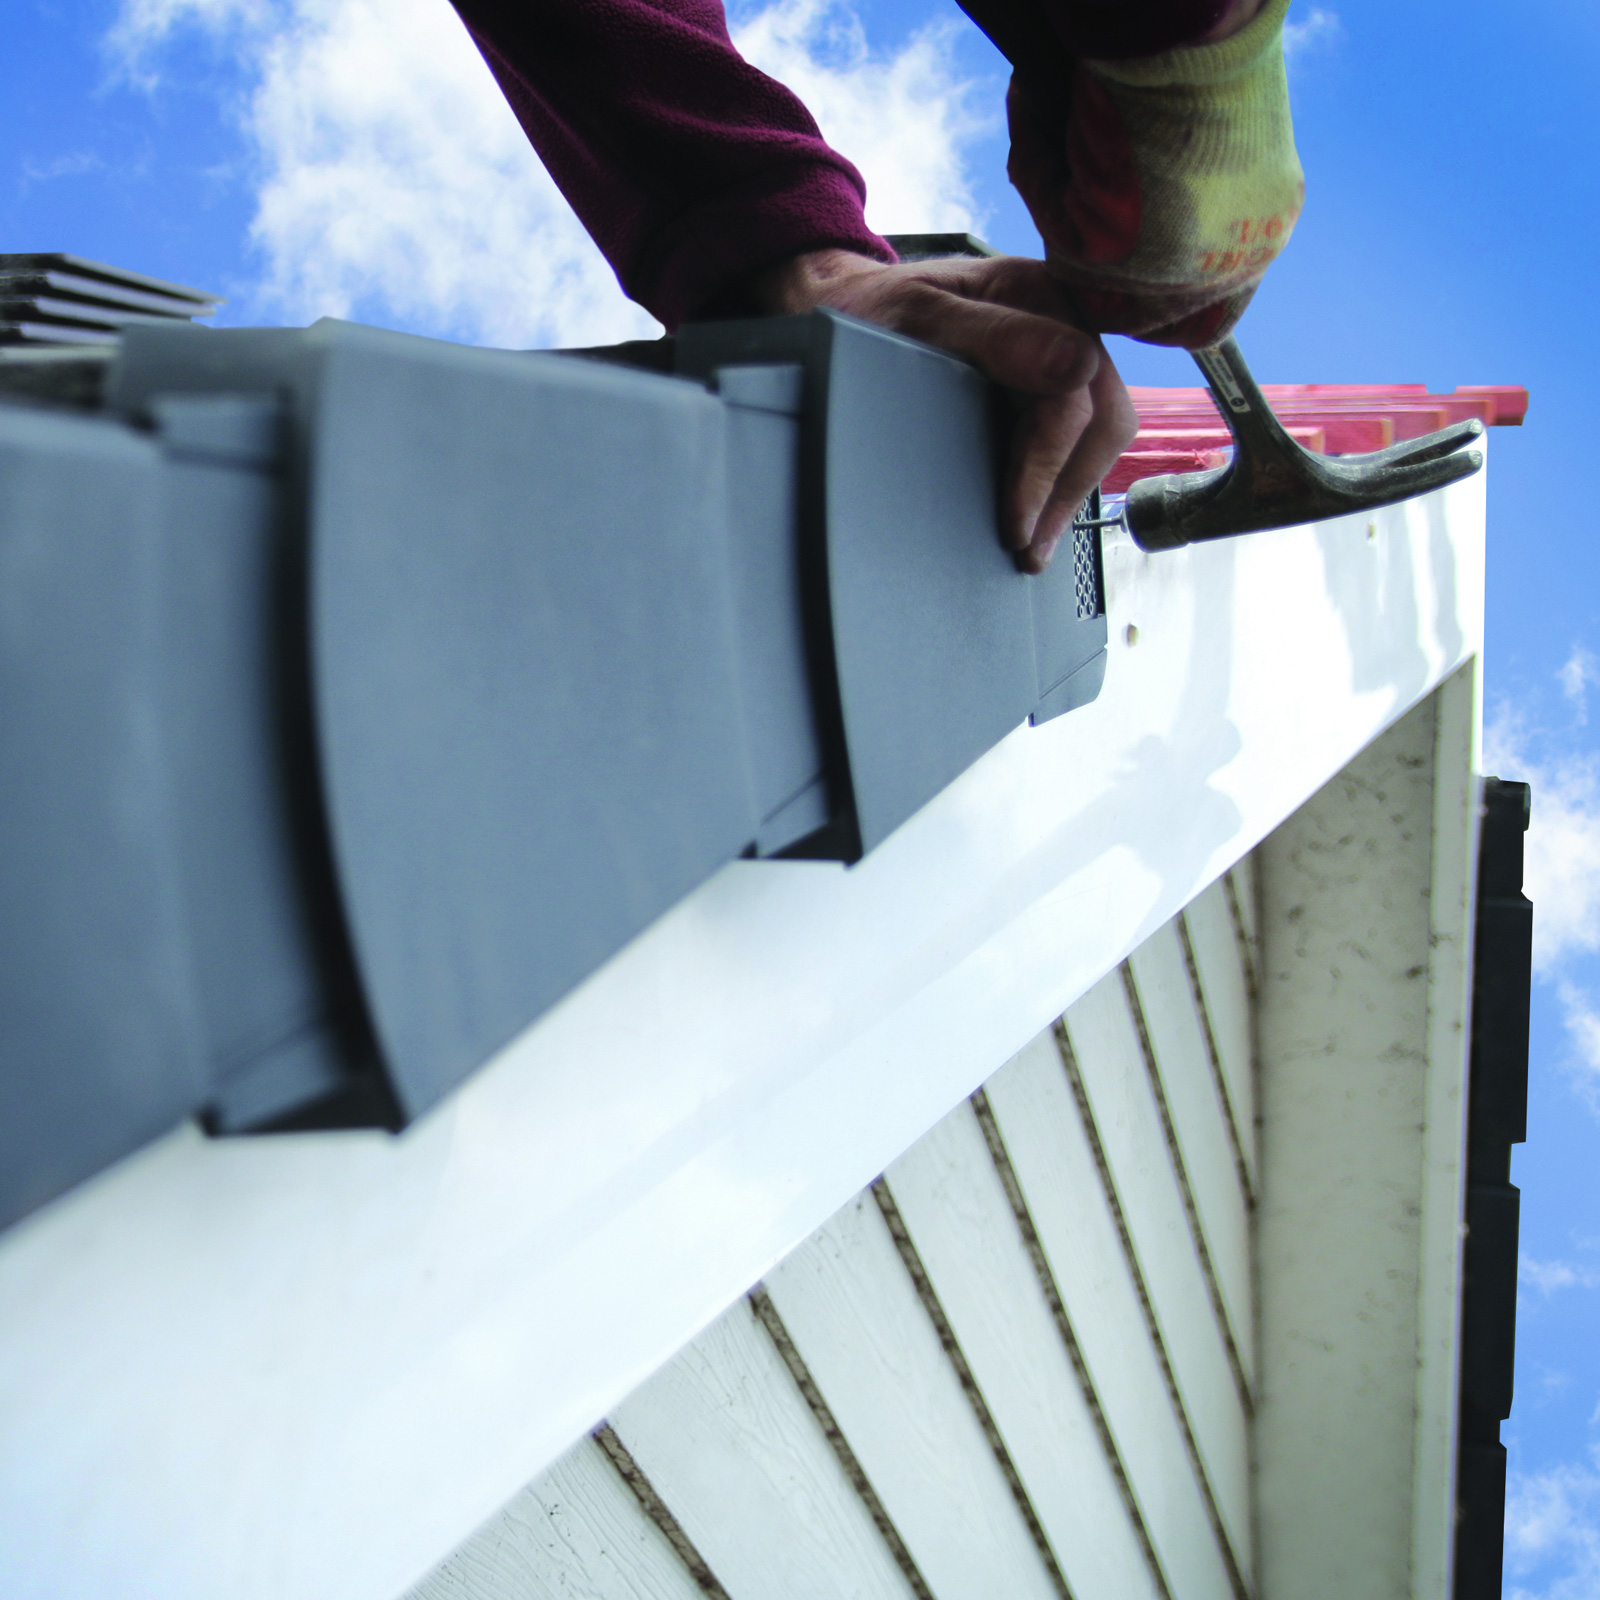 Easyverge U Universal Roof Dry Verge Kit 10 Units Domed